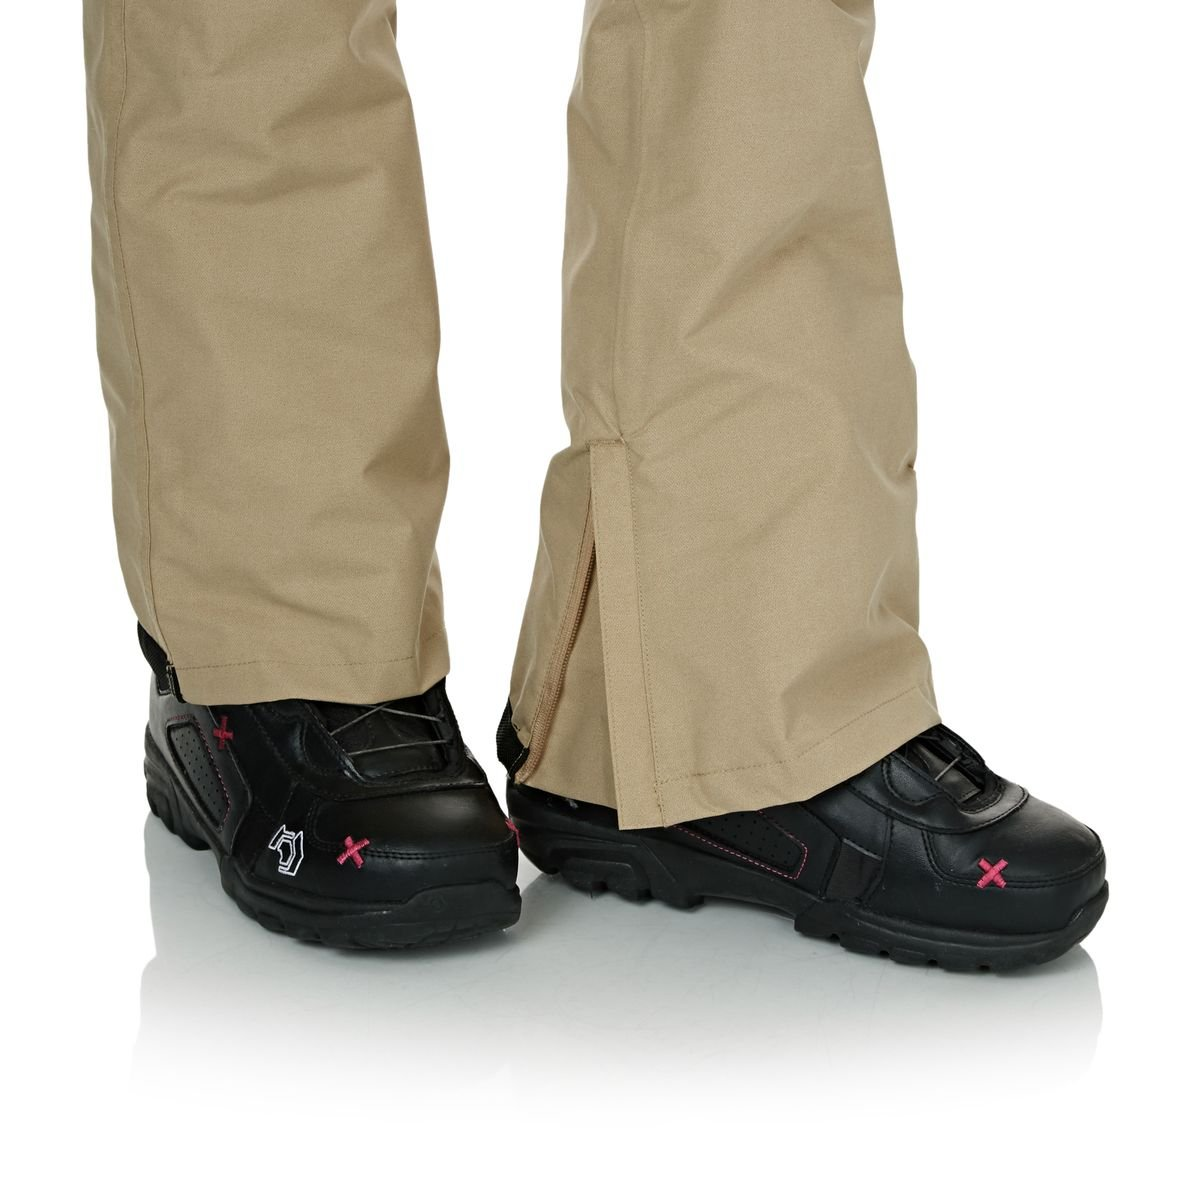 DC Shoes Viva Snow-Hose f/ür Frauen EDJTP03012